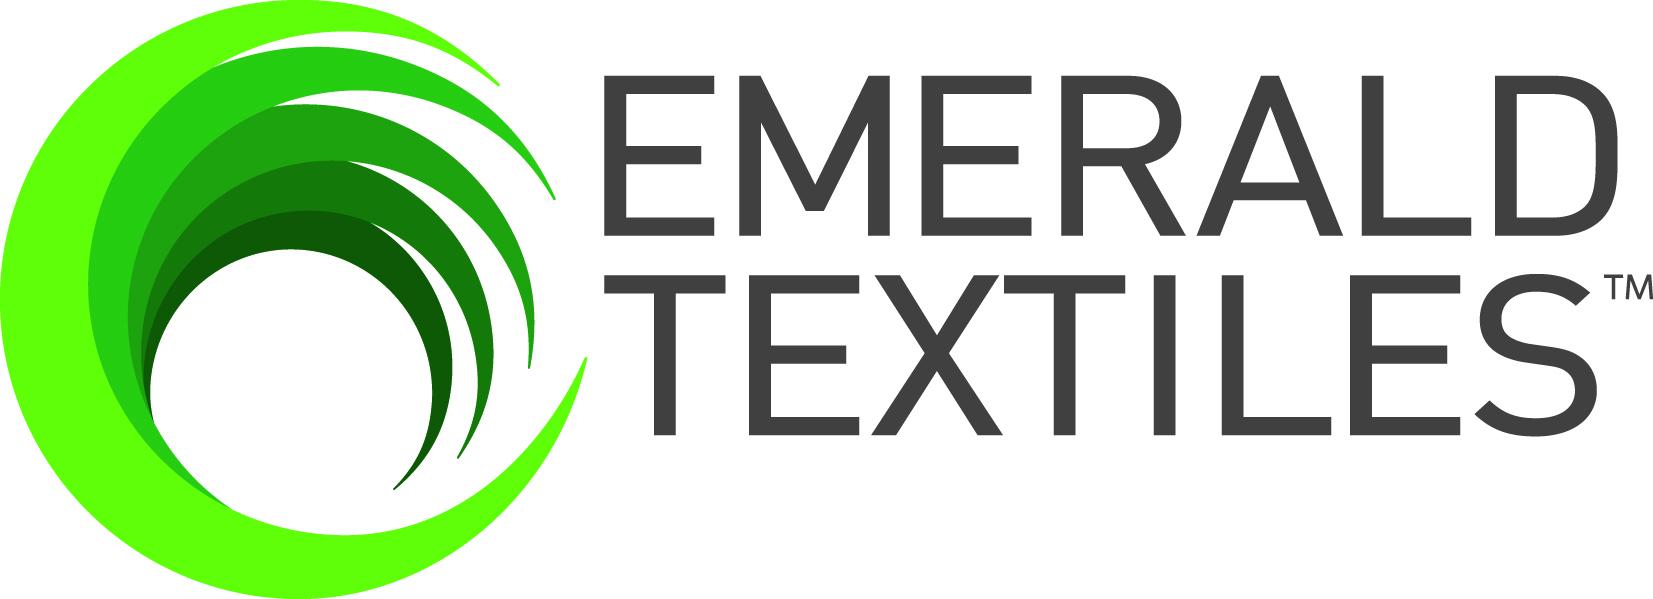 EmeraldTextiles_CMYK.jpg